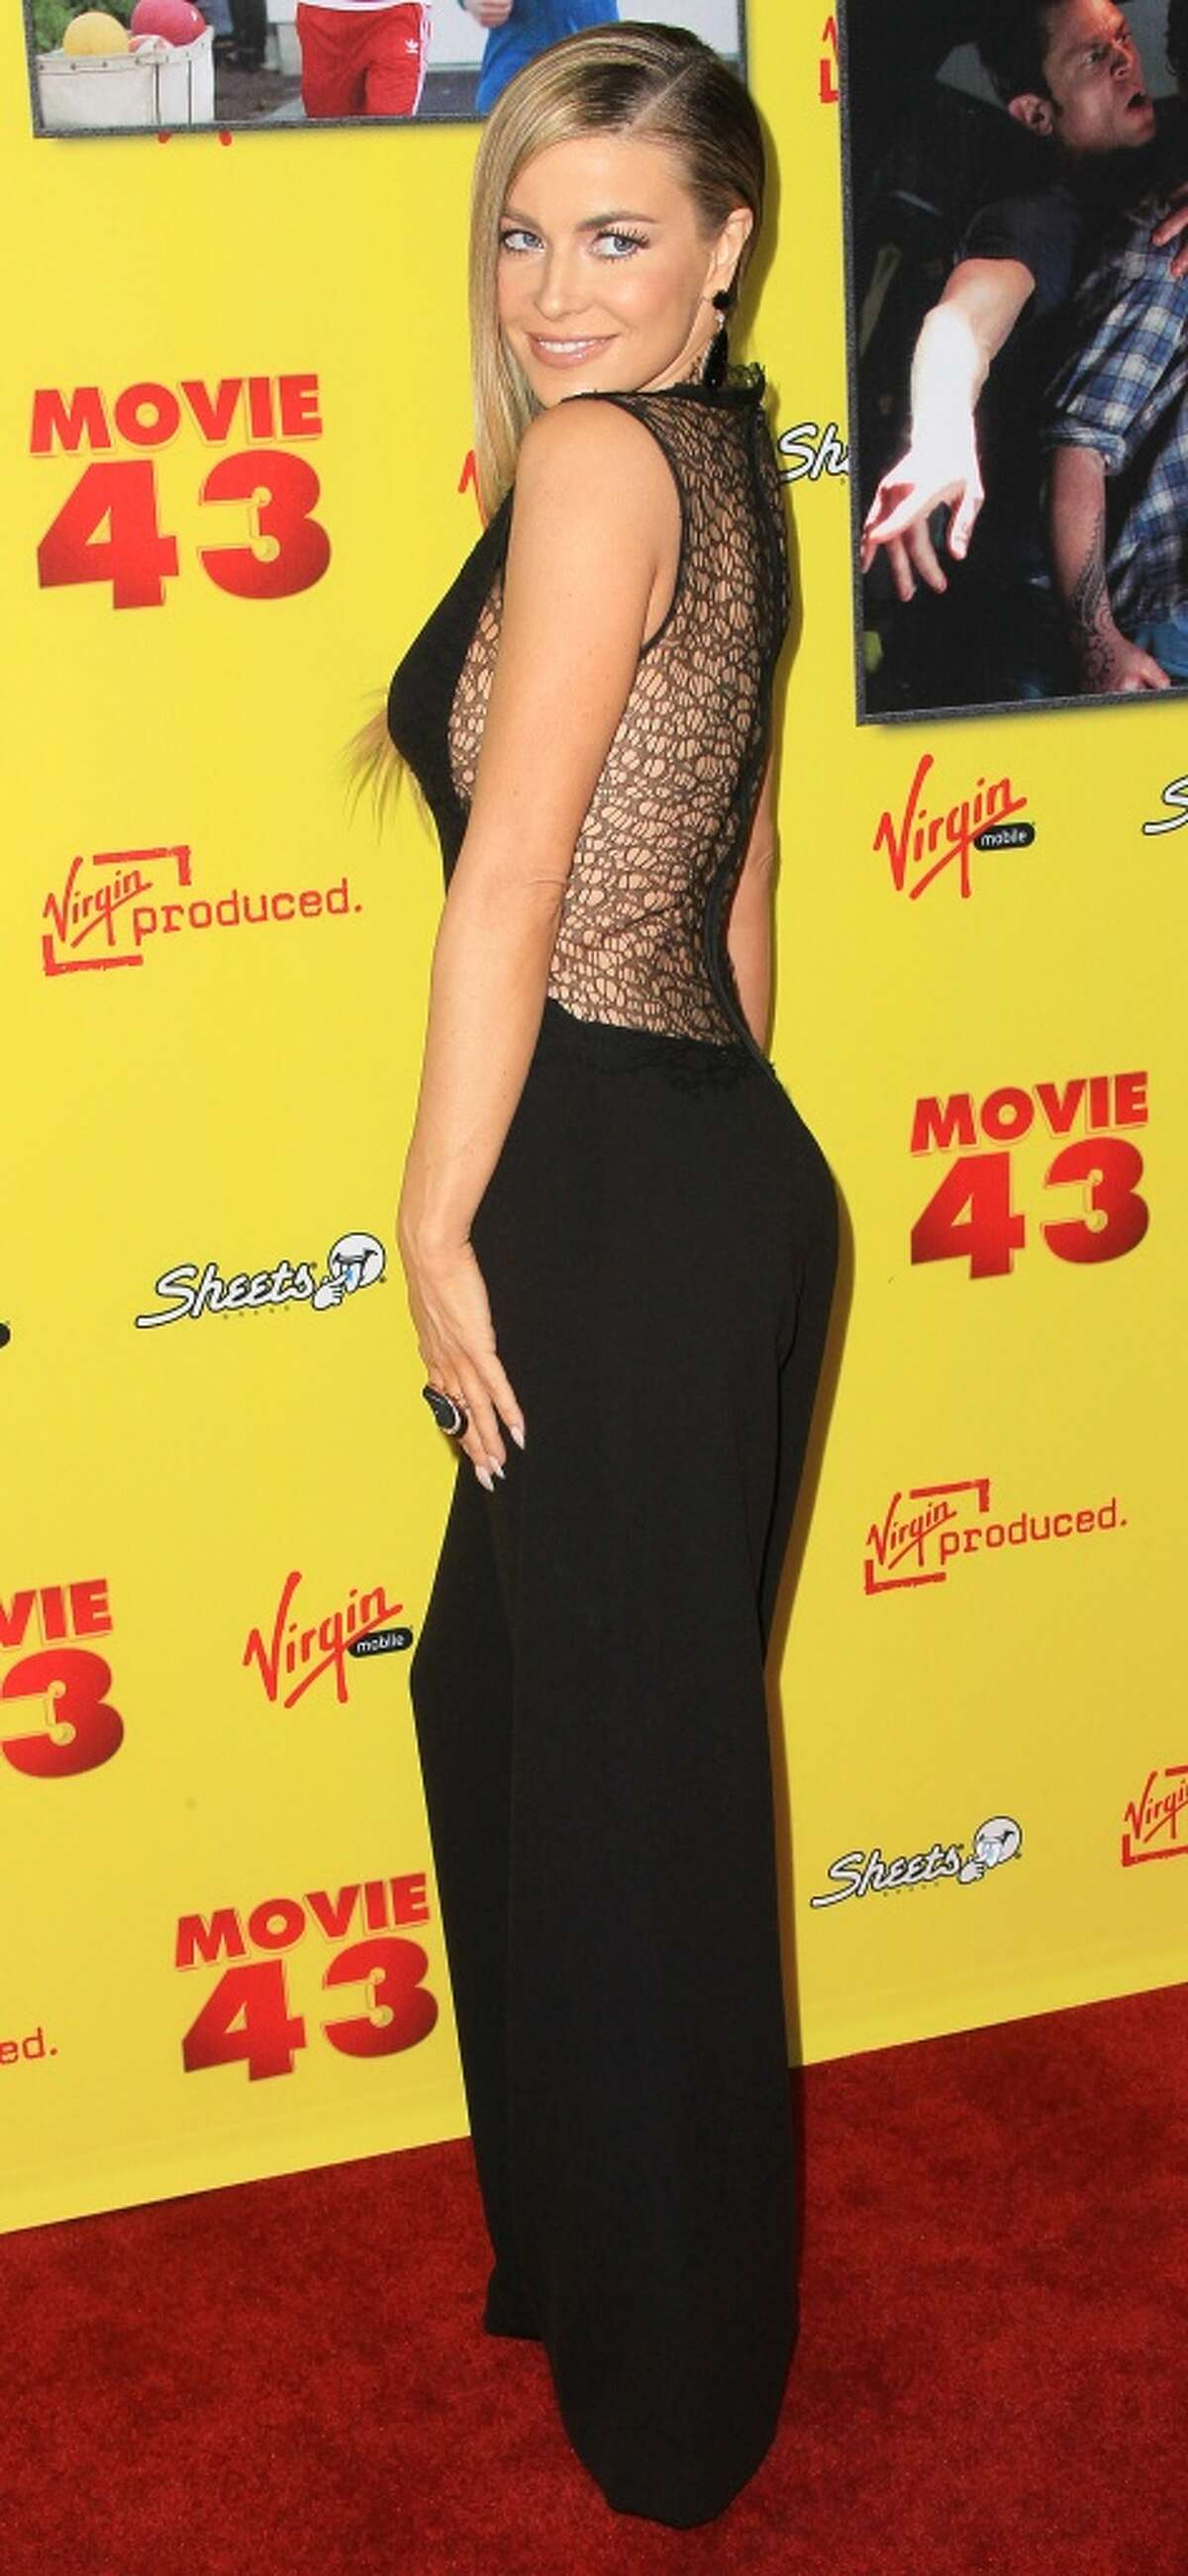 Actress Carmen Electra January 23, 2013 in Hollywood, California.